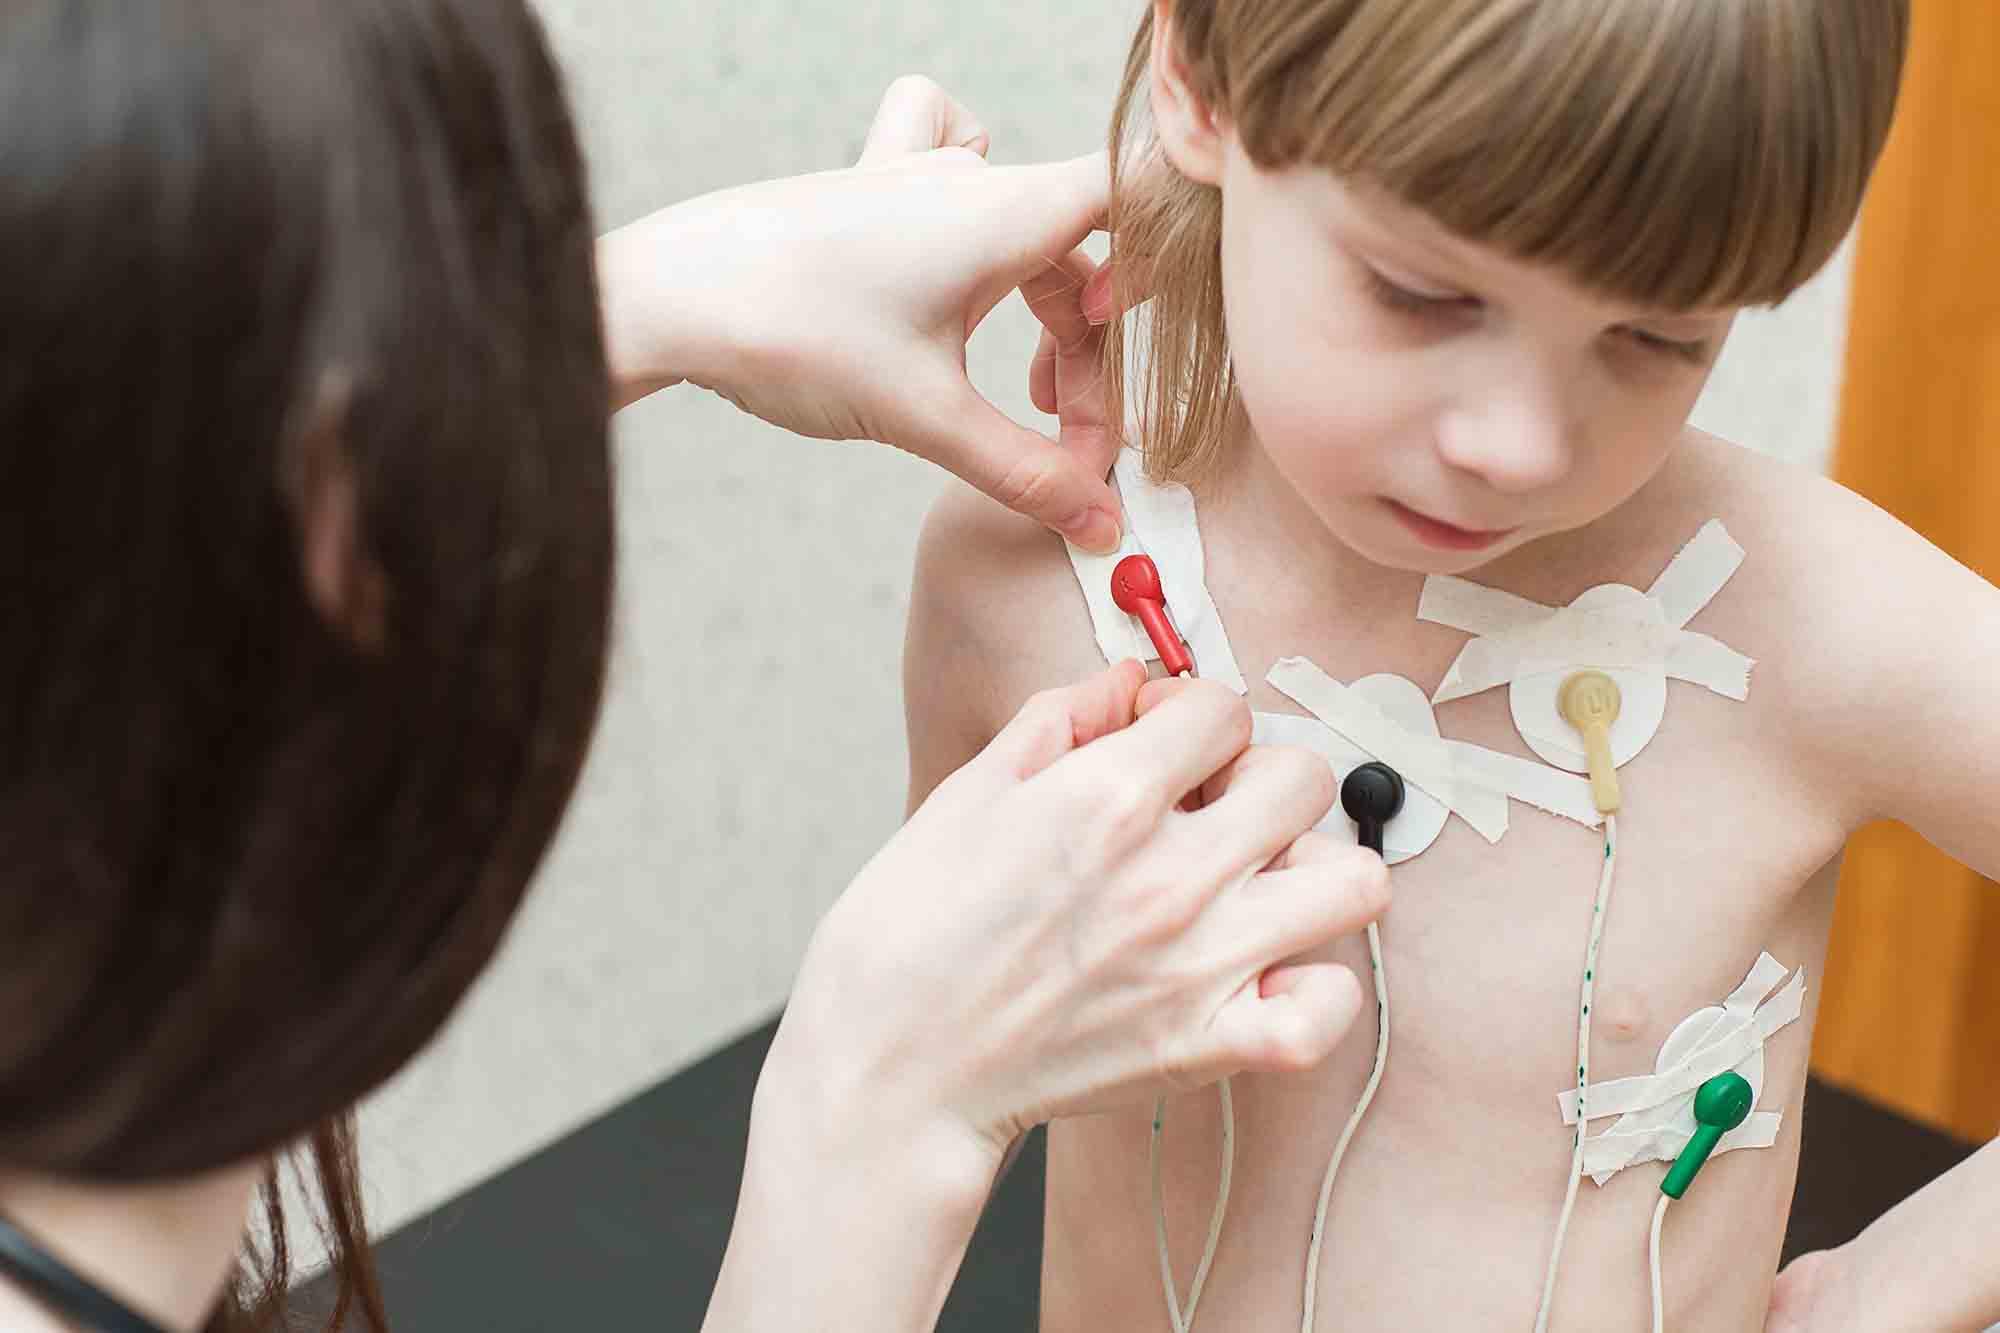 valores normais para ECG infantil